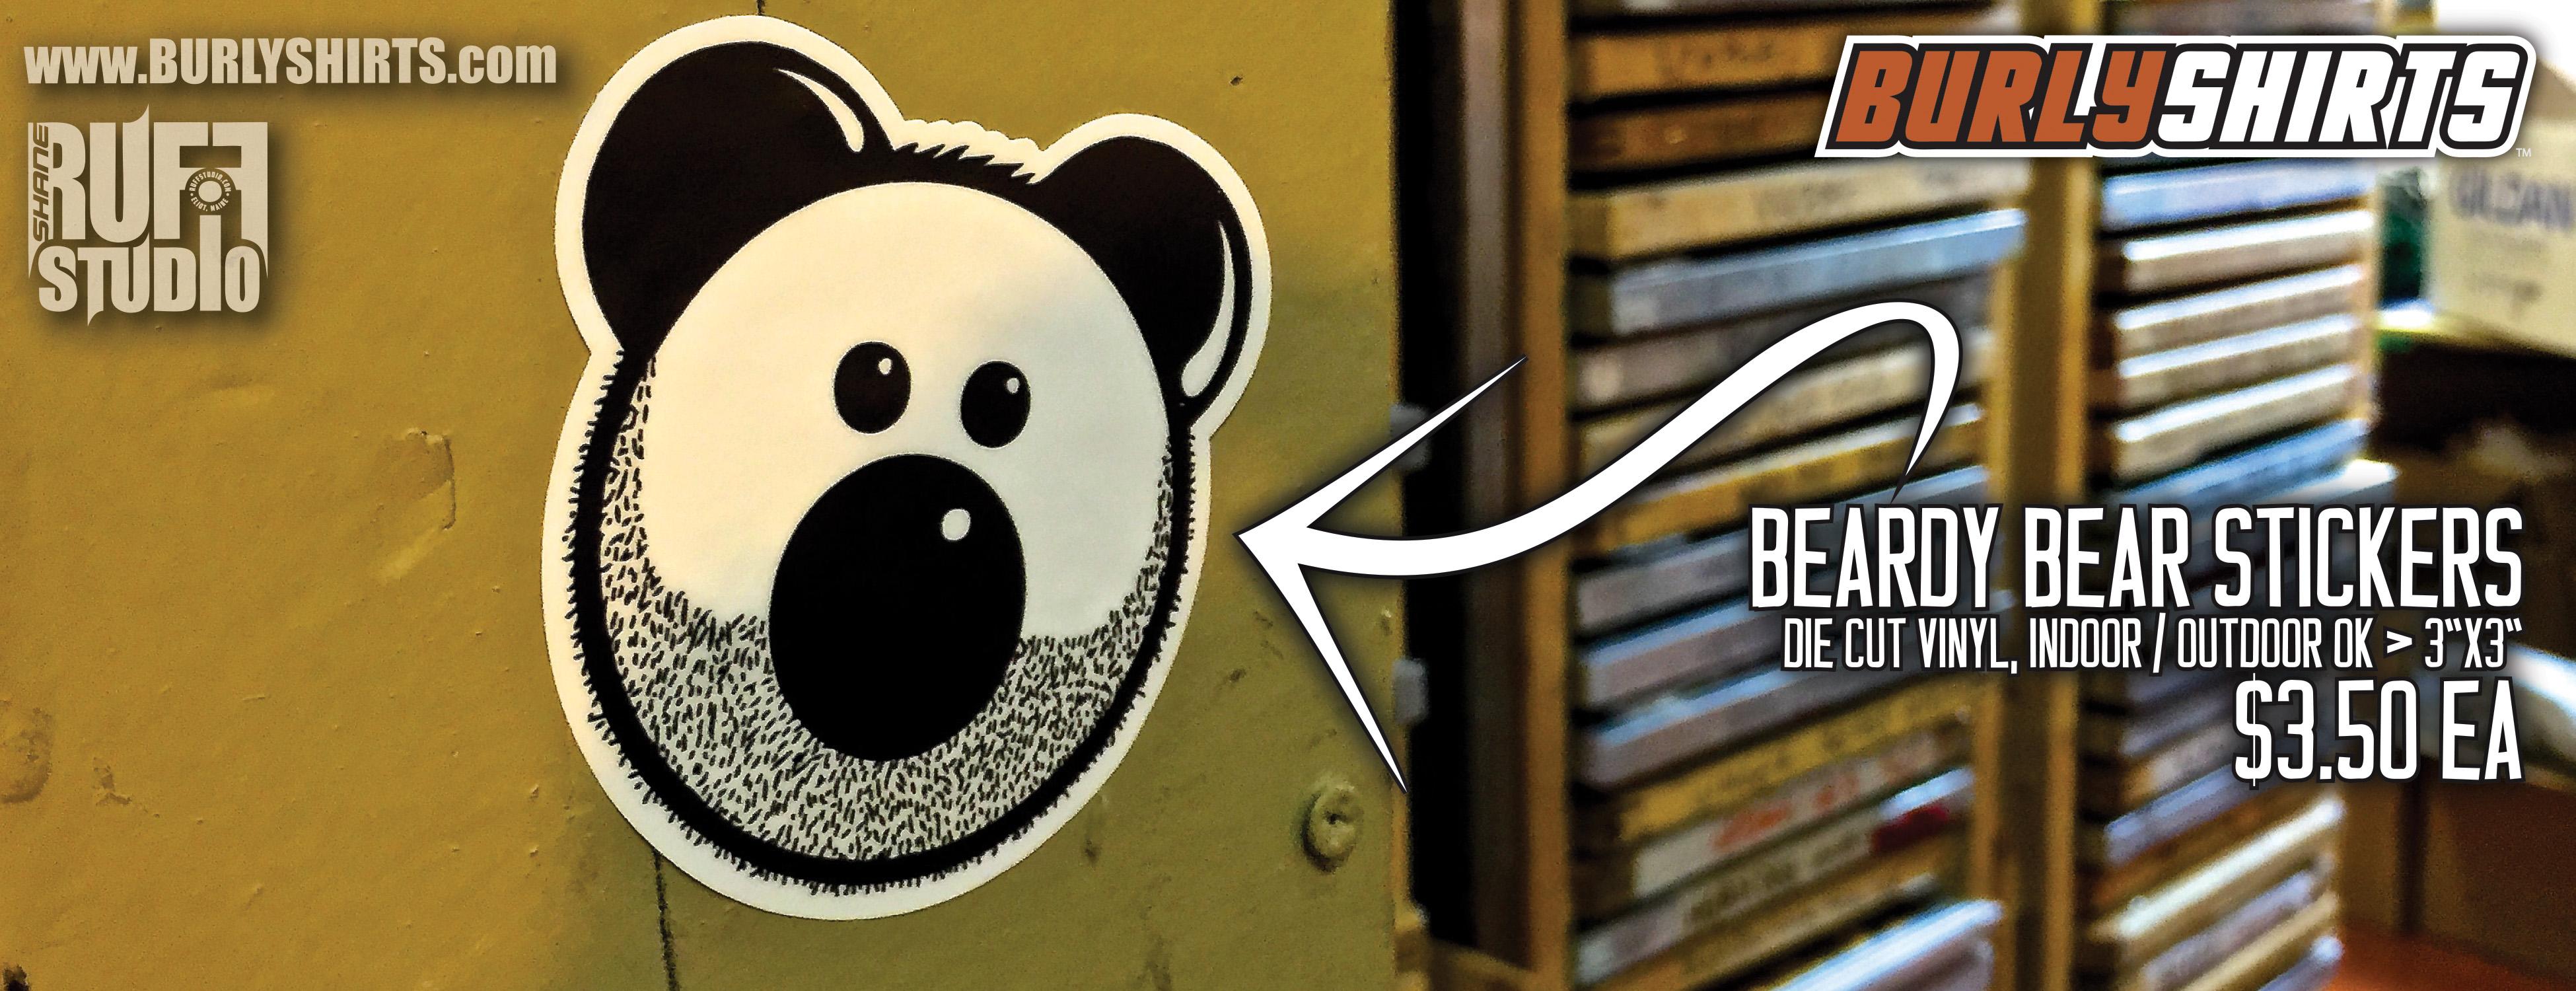 beardy-bear-sticker1.jpg